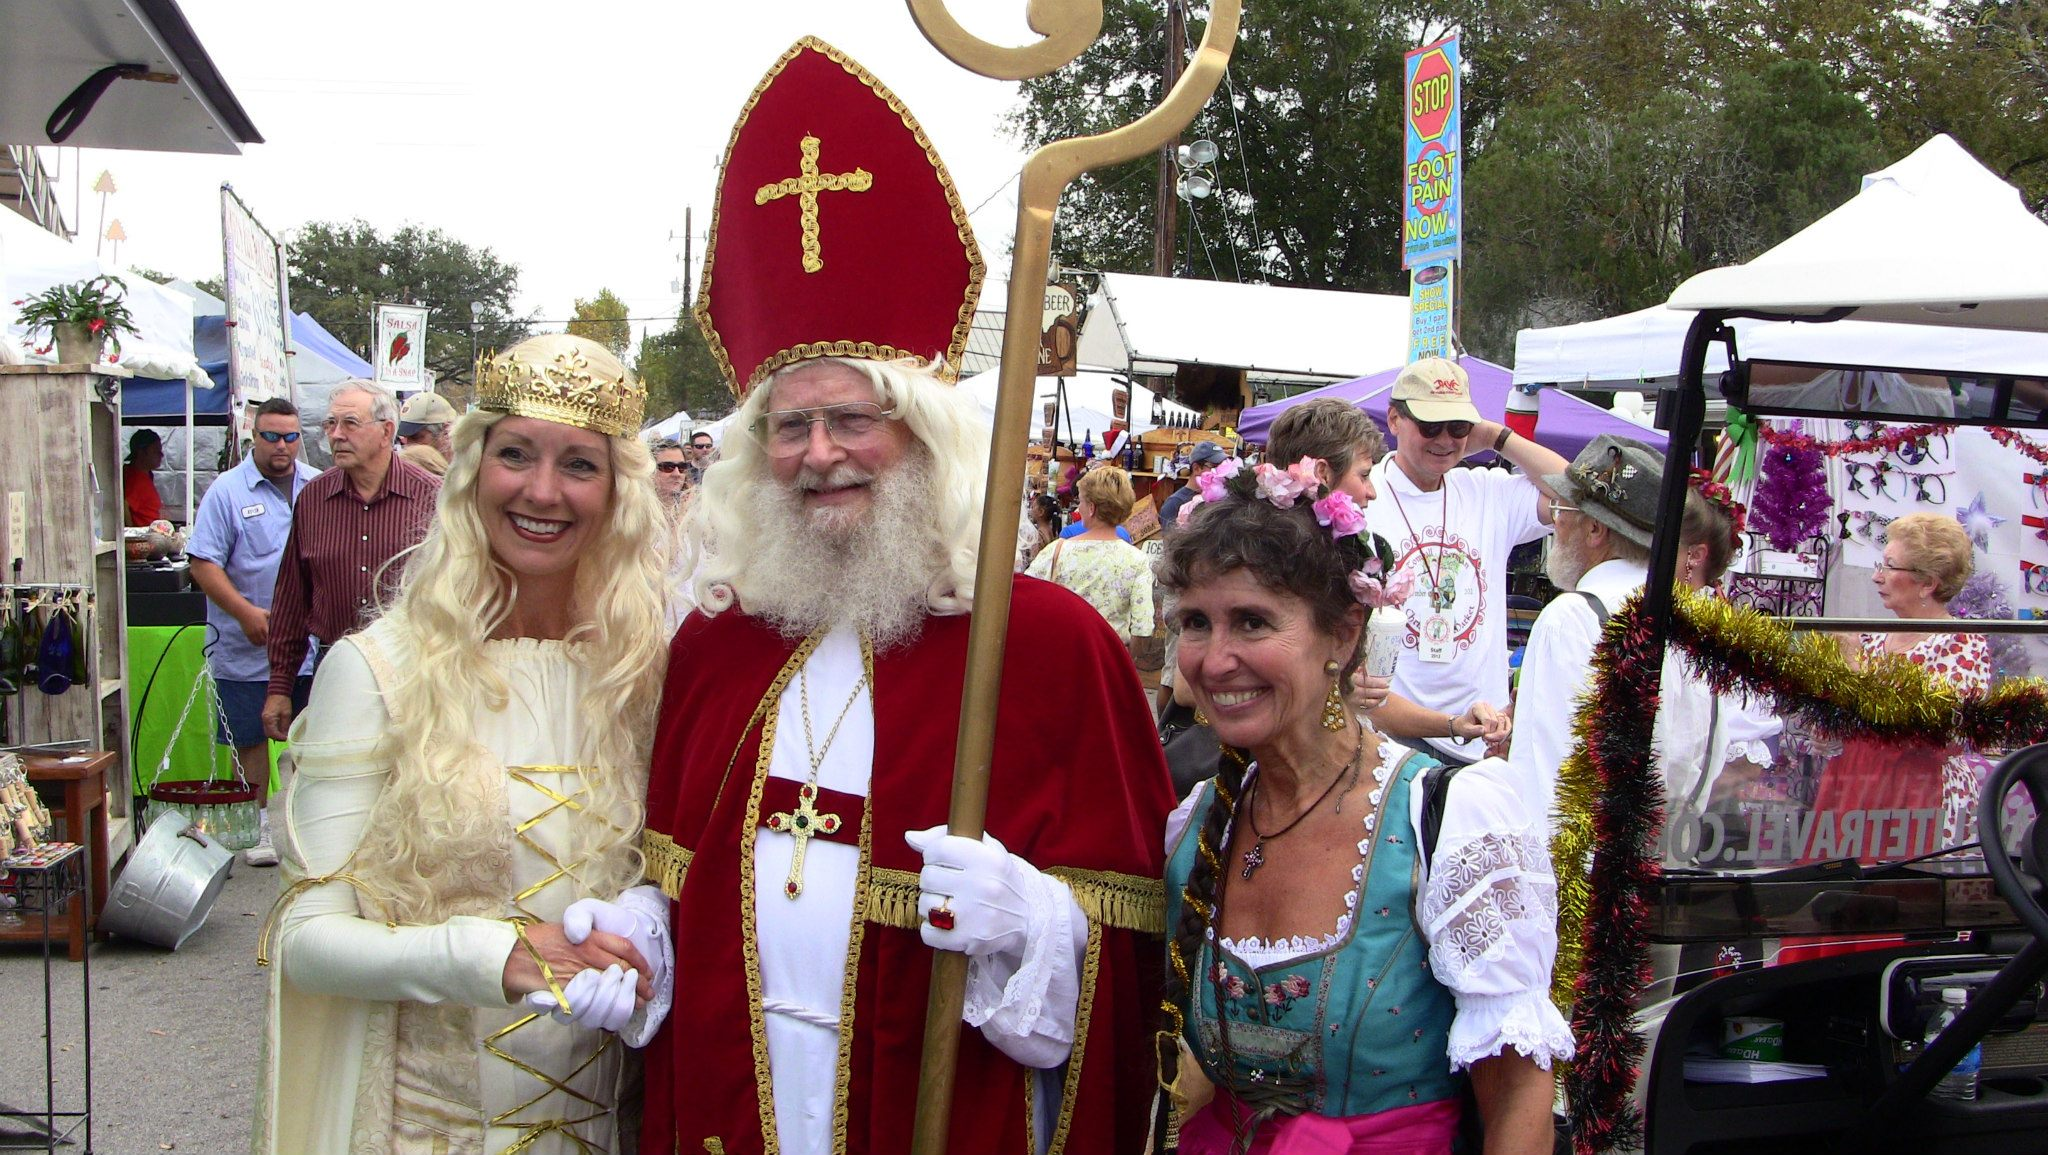 Tomball German Festival 2020.Tomball German Christmas Market Celebrates Area Heritage